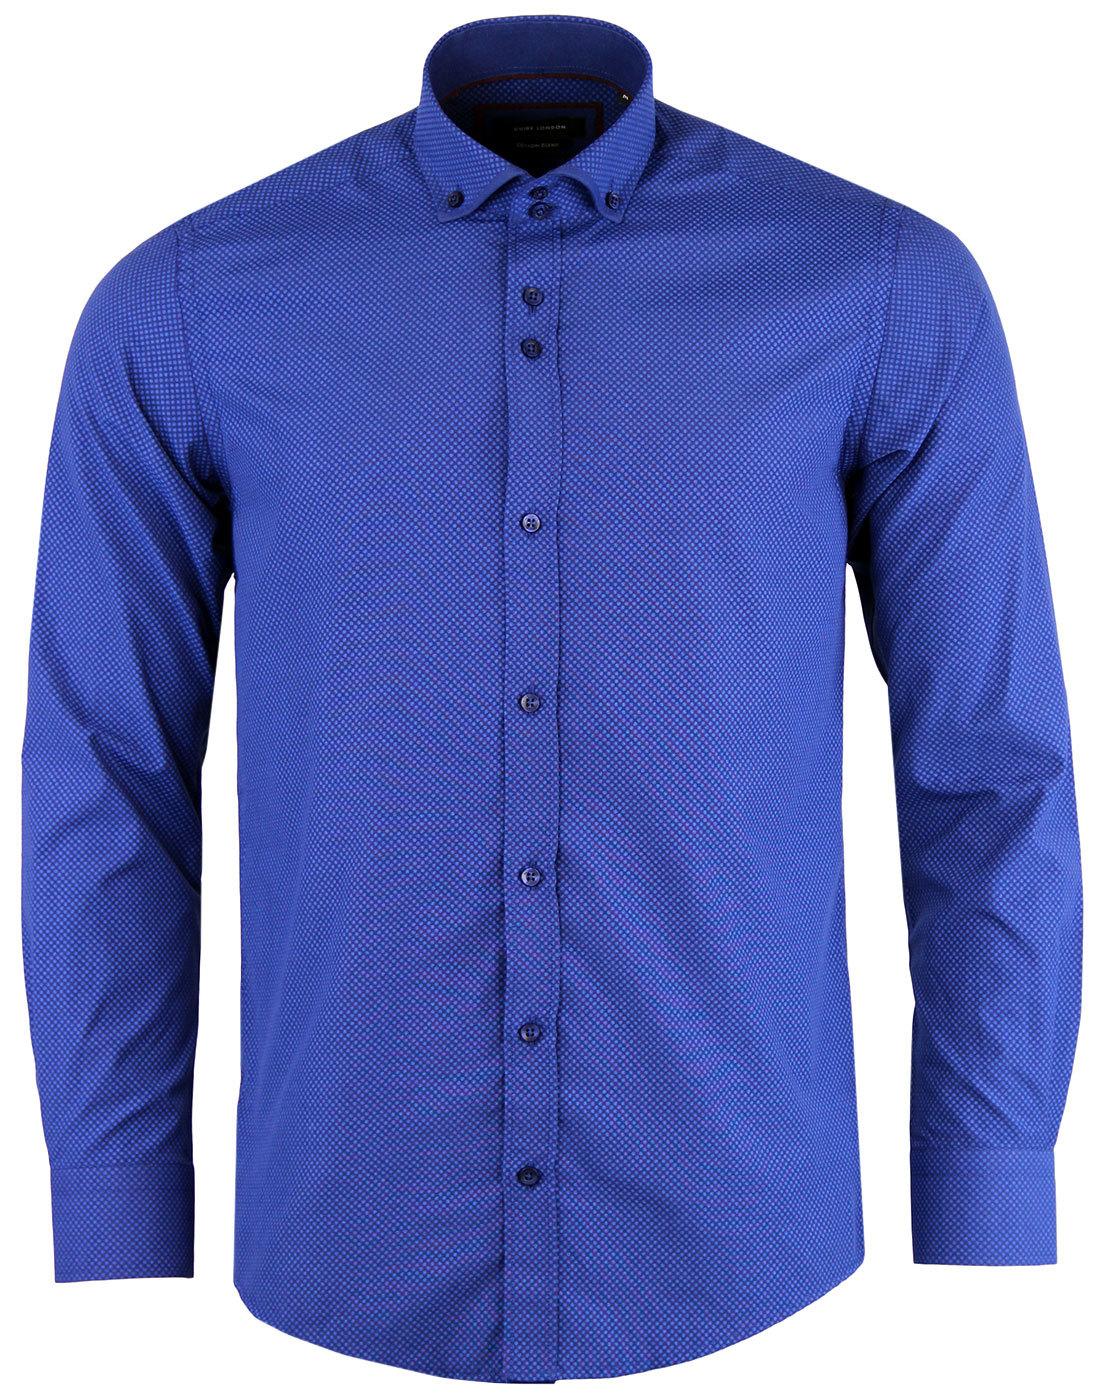 GUIDE LONDON Retro 60s Mod Circle Dot Shirt BLUE